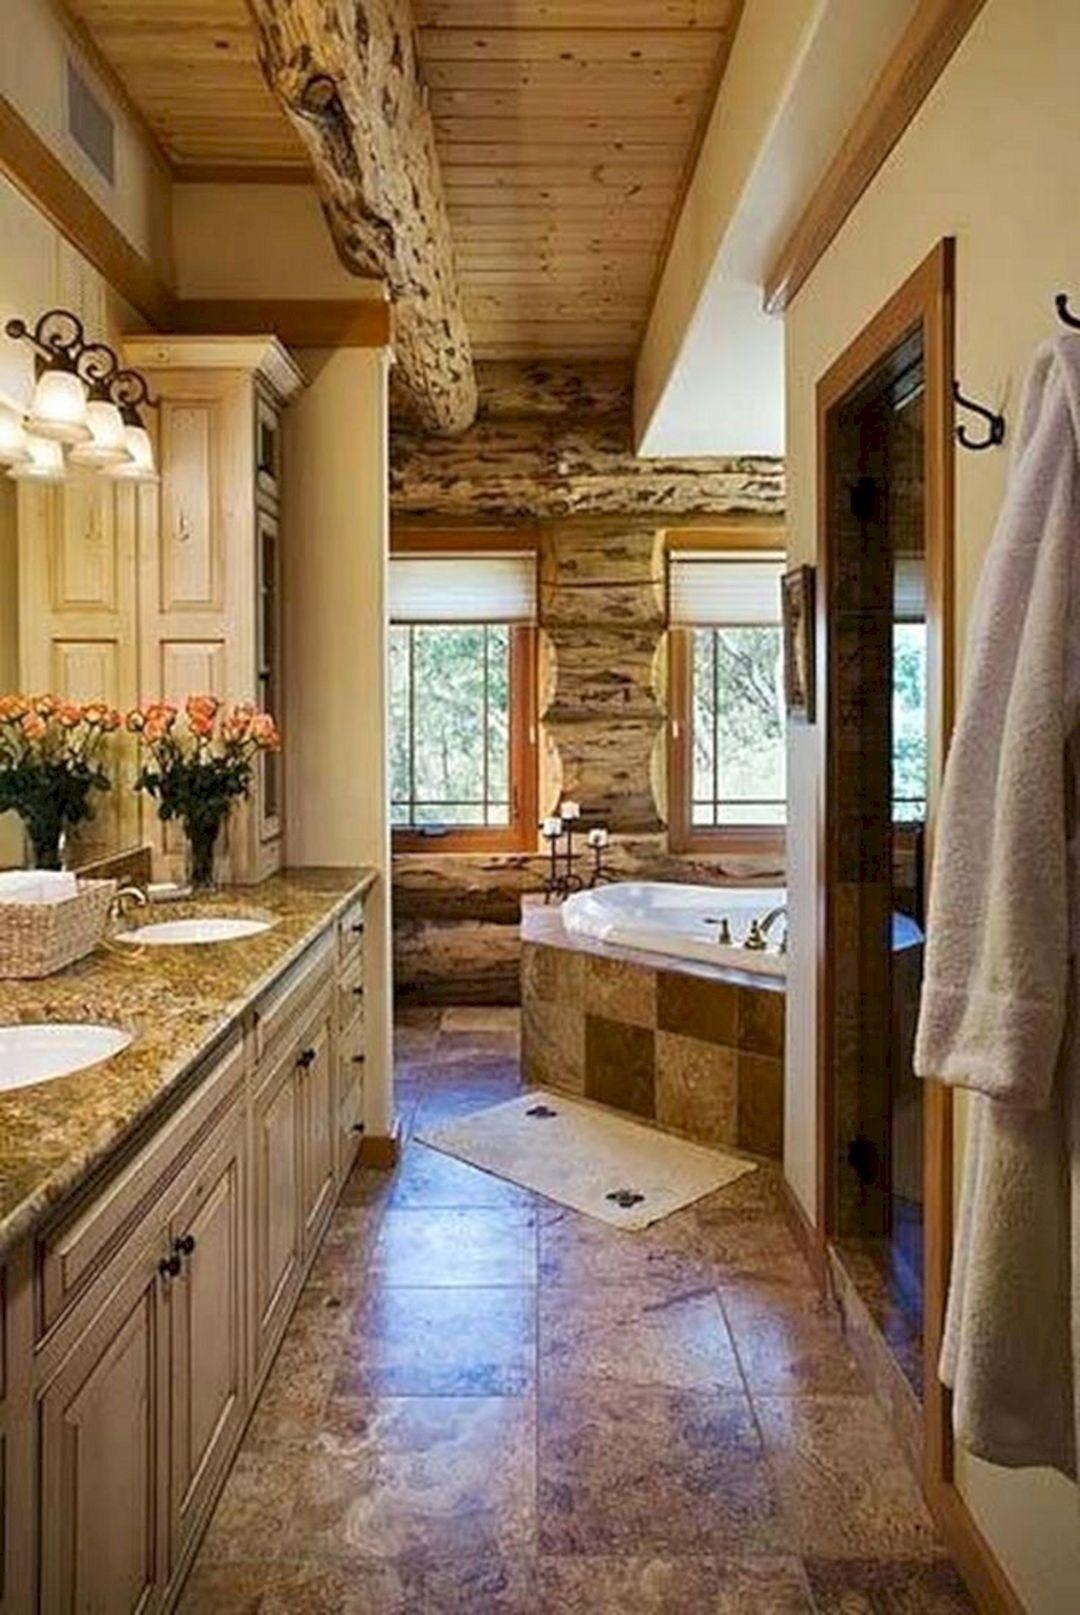 30+ Beautiful Rustic Bathroom Design Ideas You Should Have It #rusticbathroomdesigns